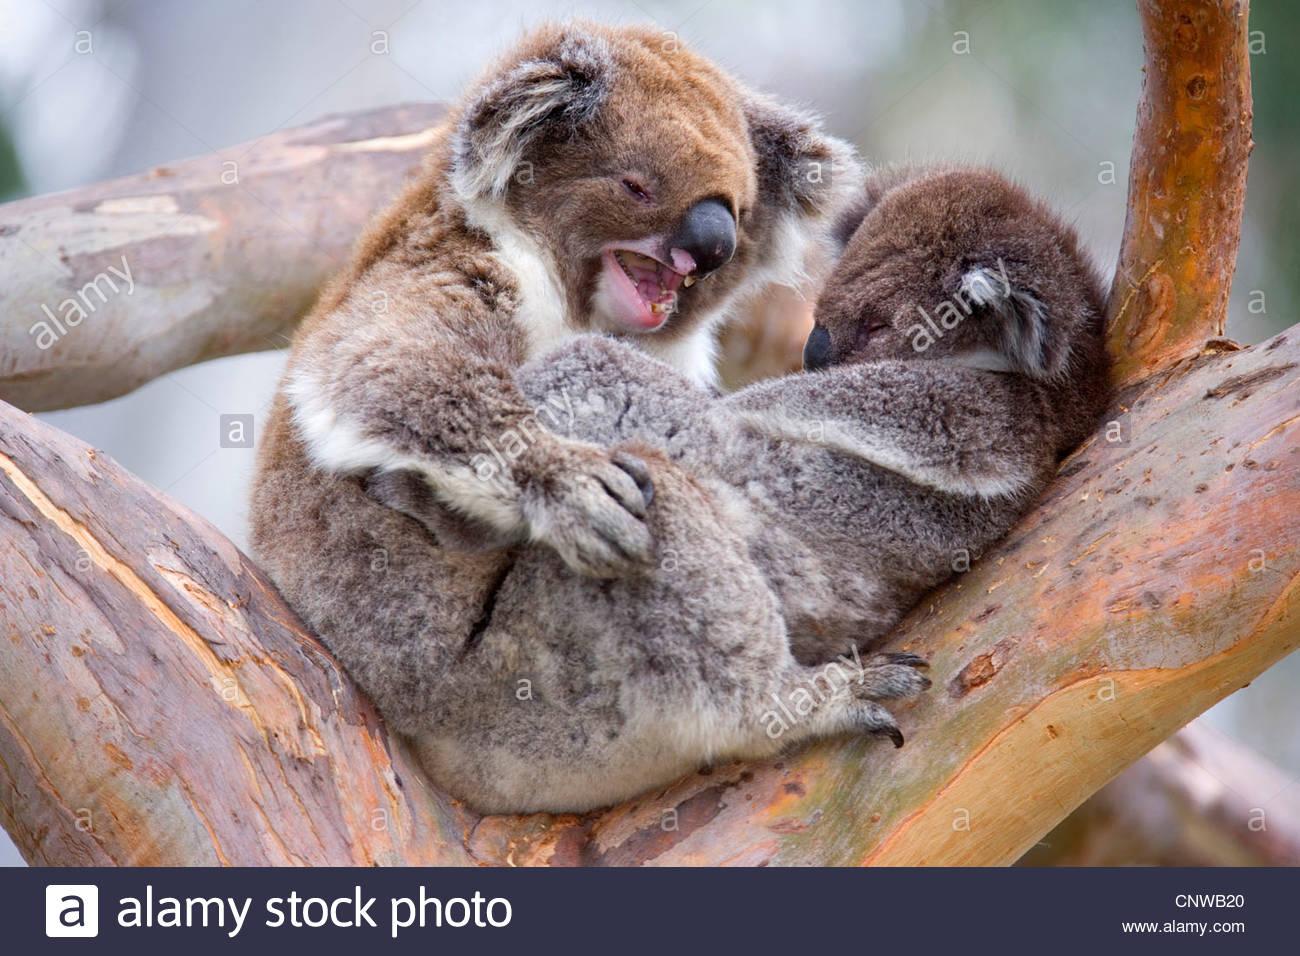 koala koala bear phascolarctos cinereus mother and child in a